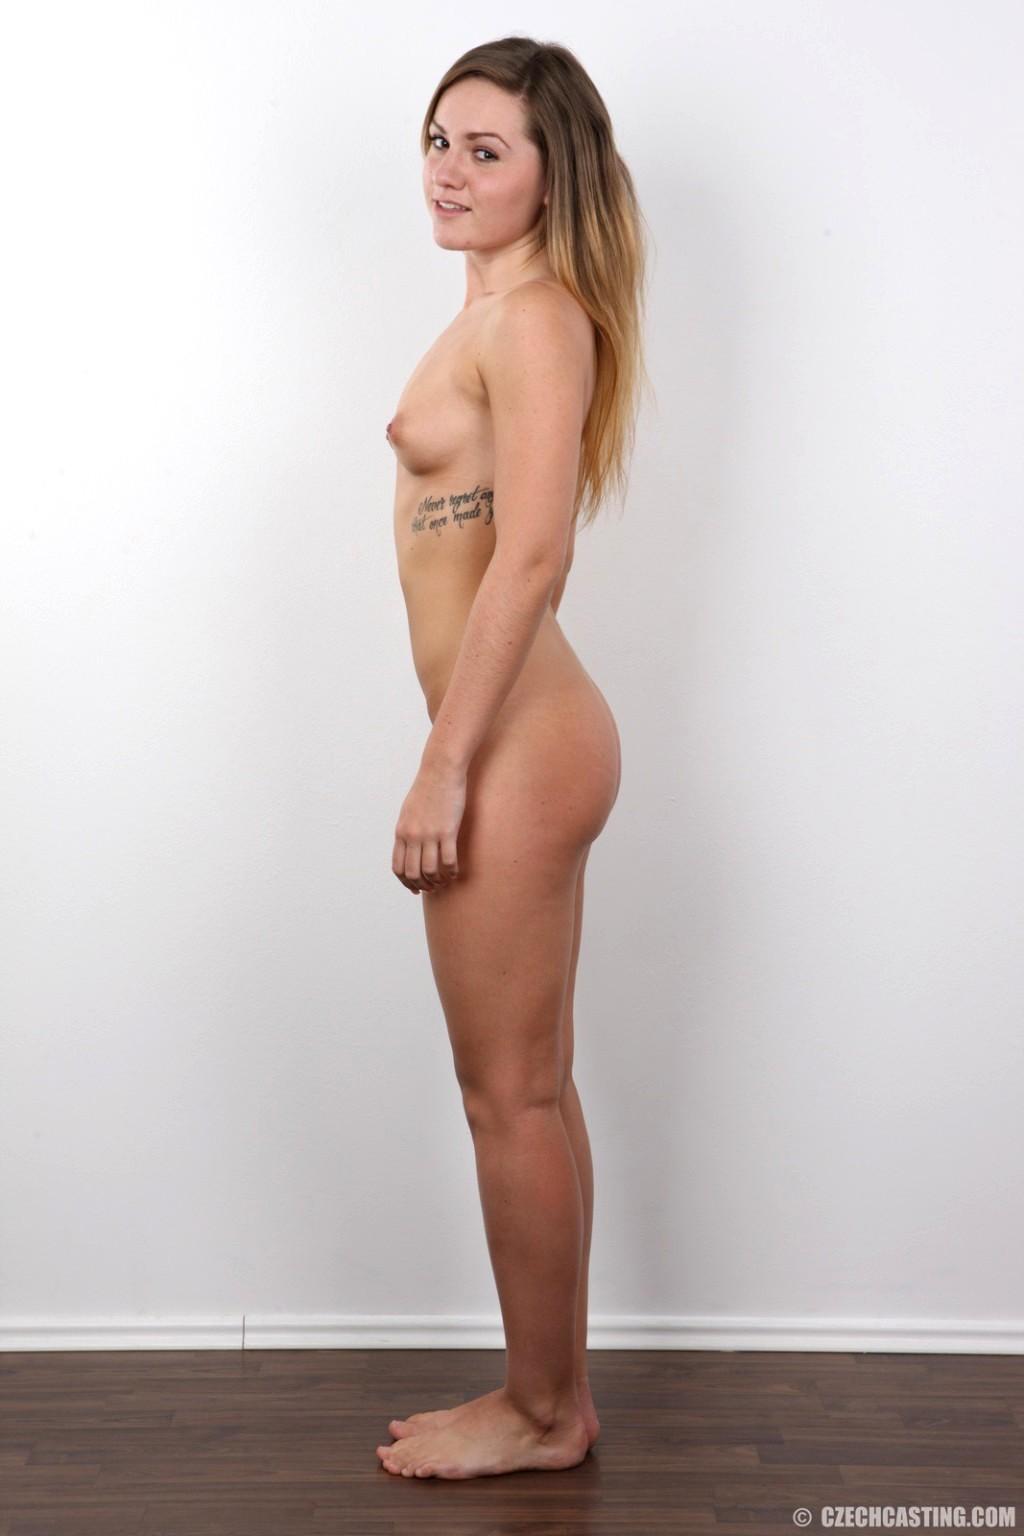 Babe On Porno Casting babe today czech casting czechcasting model xxx young porno